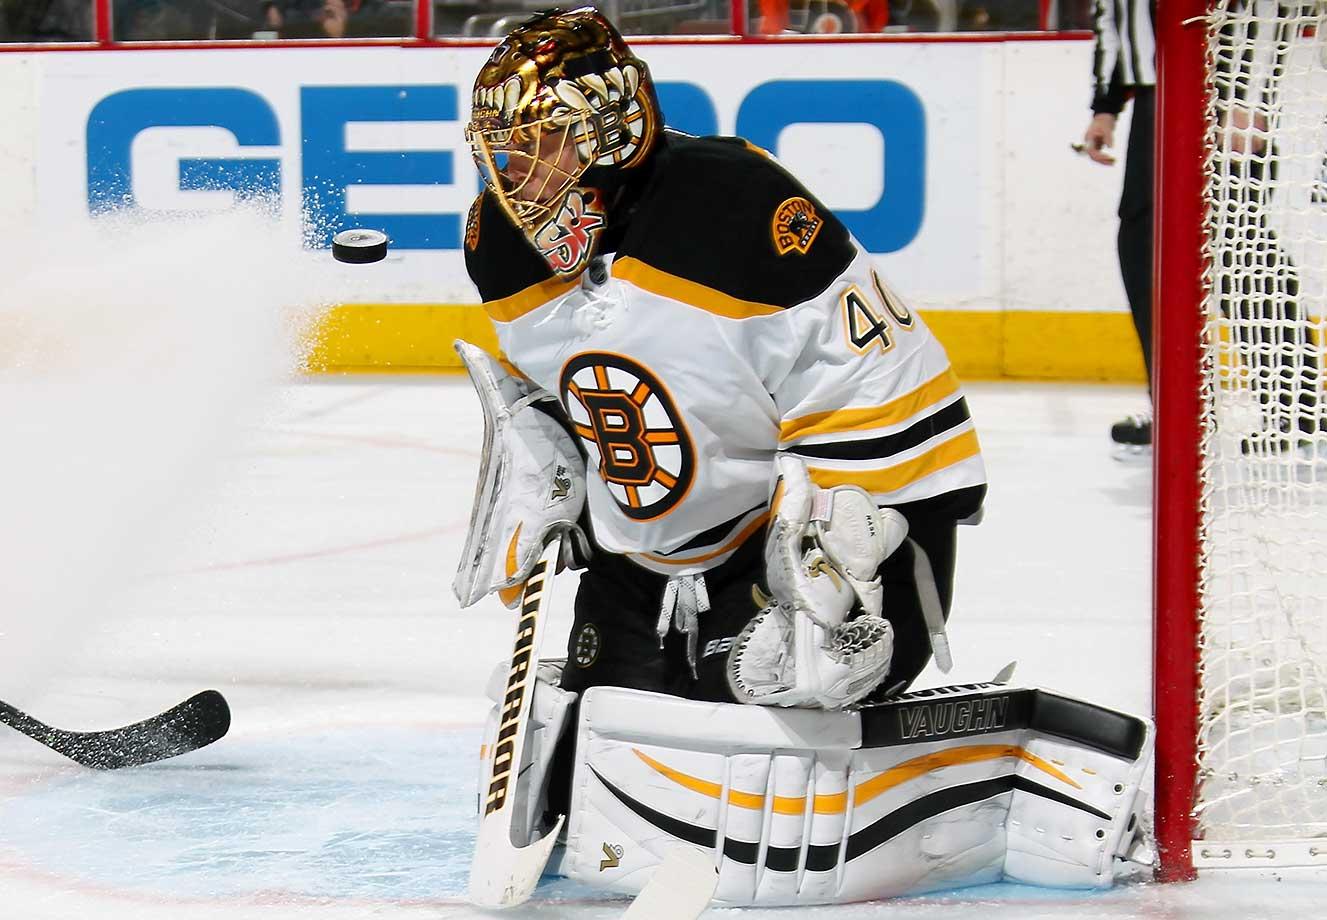 Tuukka Rask of the Boston Bruins tracks the puck as it is shot towards his mask against the Philadelphia Flyers at the Wells Fargo Center in Philadelphia.